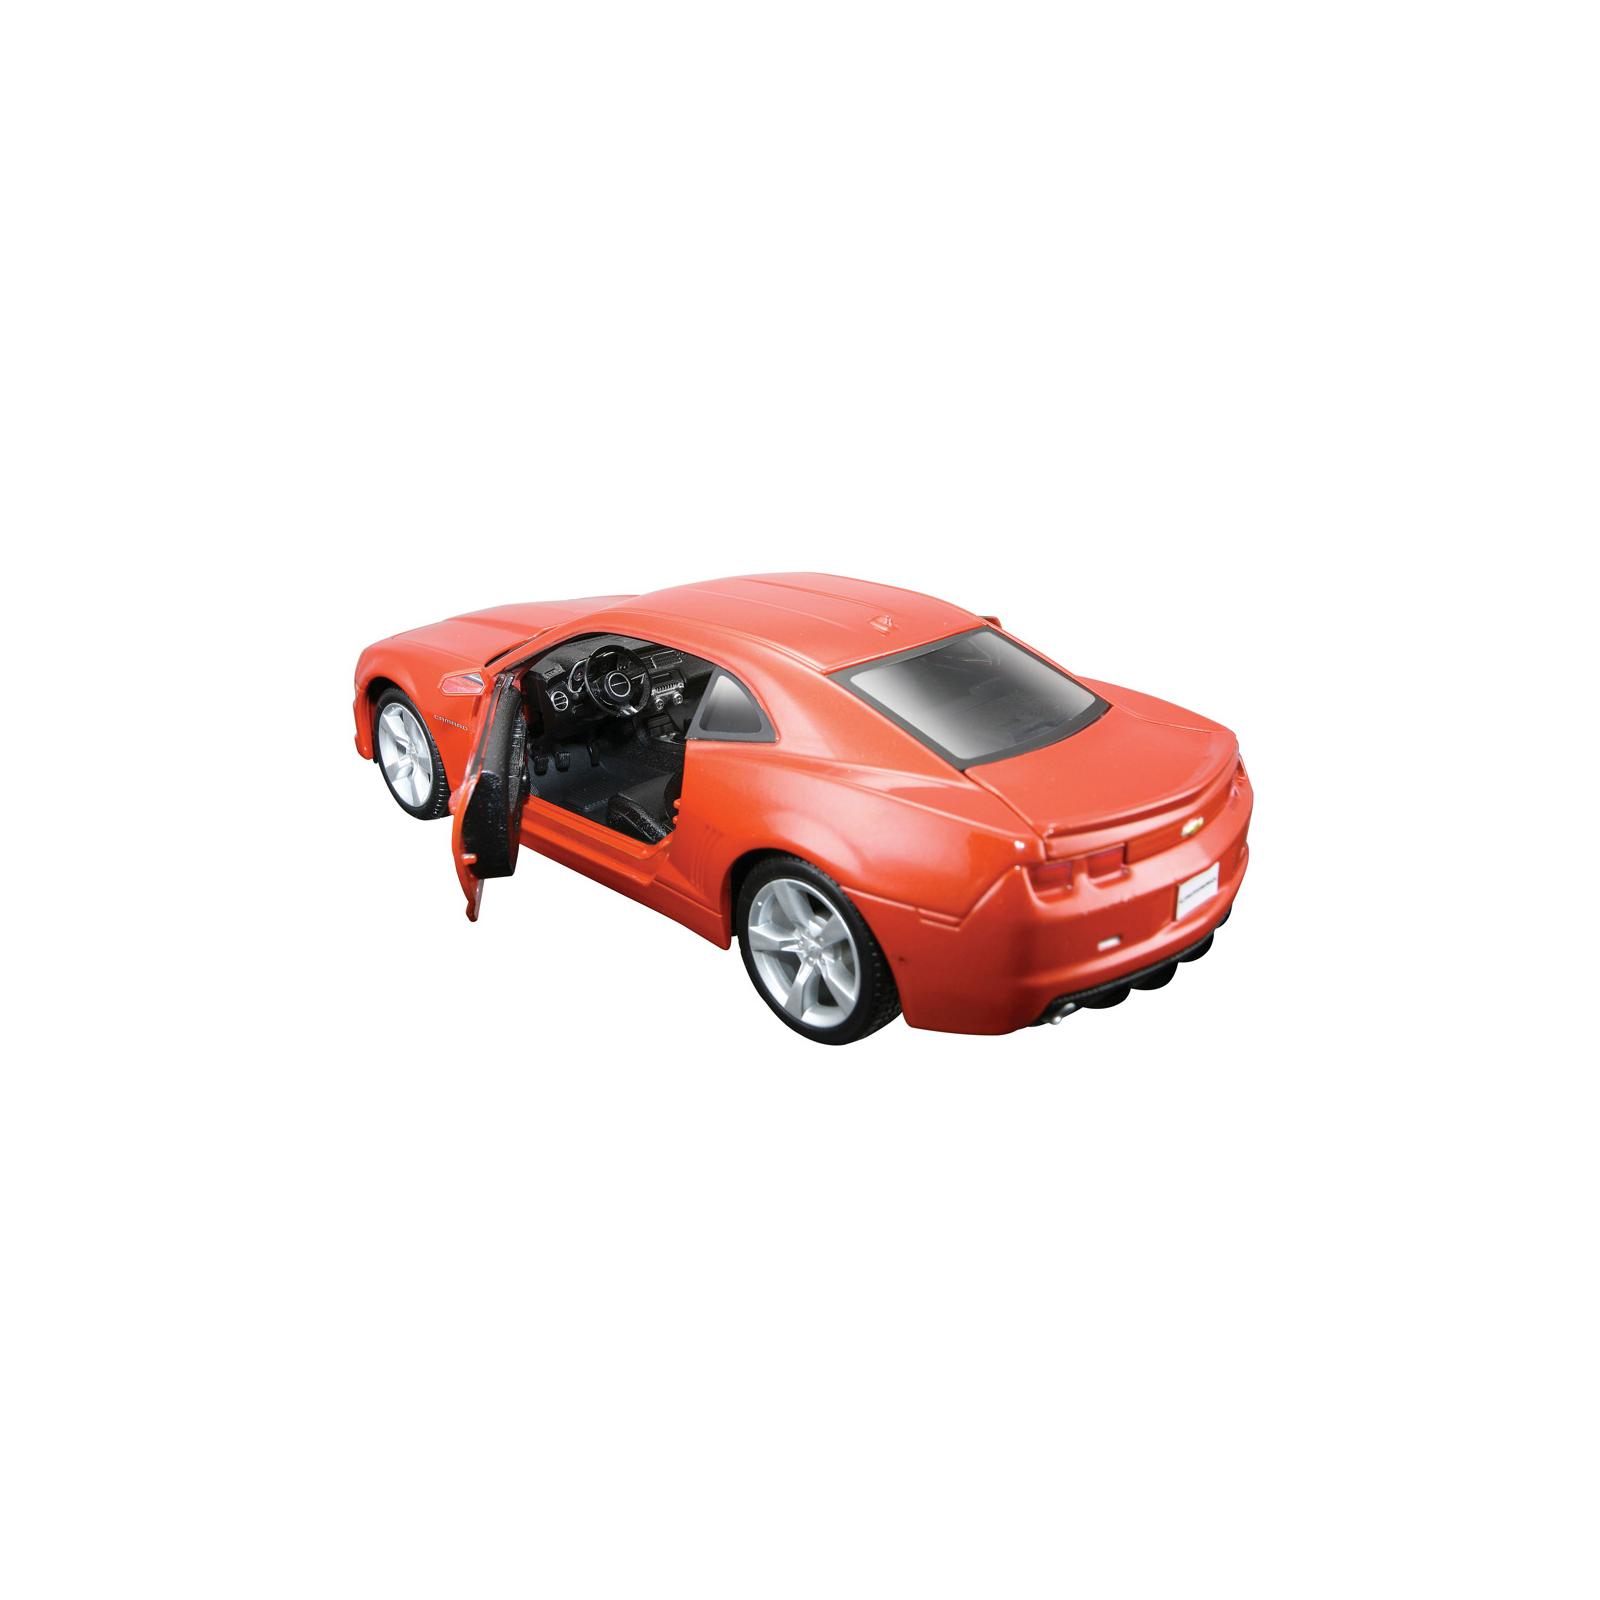 Машина Maisto Chevrolet Camaro SS RS 2010 (1:24) оранжевый металлик (31207 met. orange) изображение 4